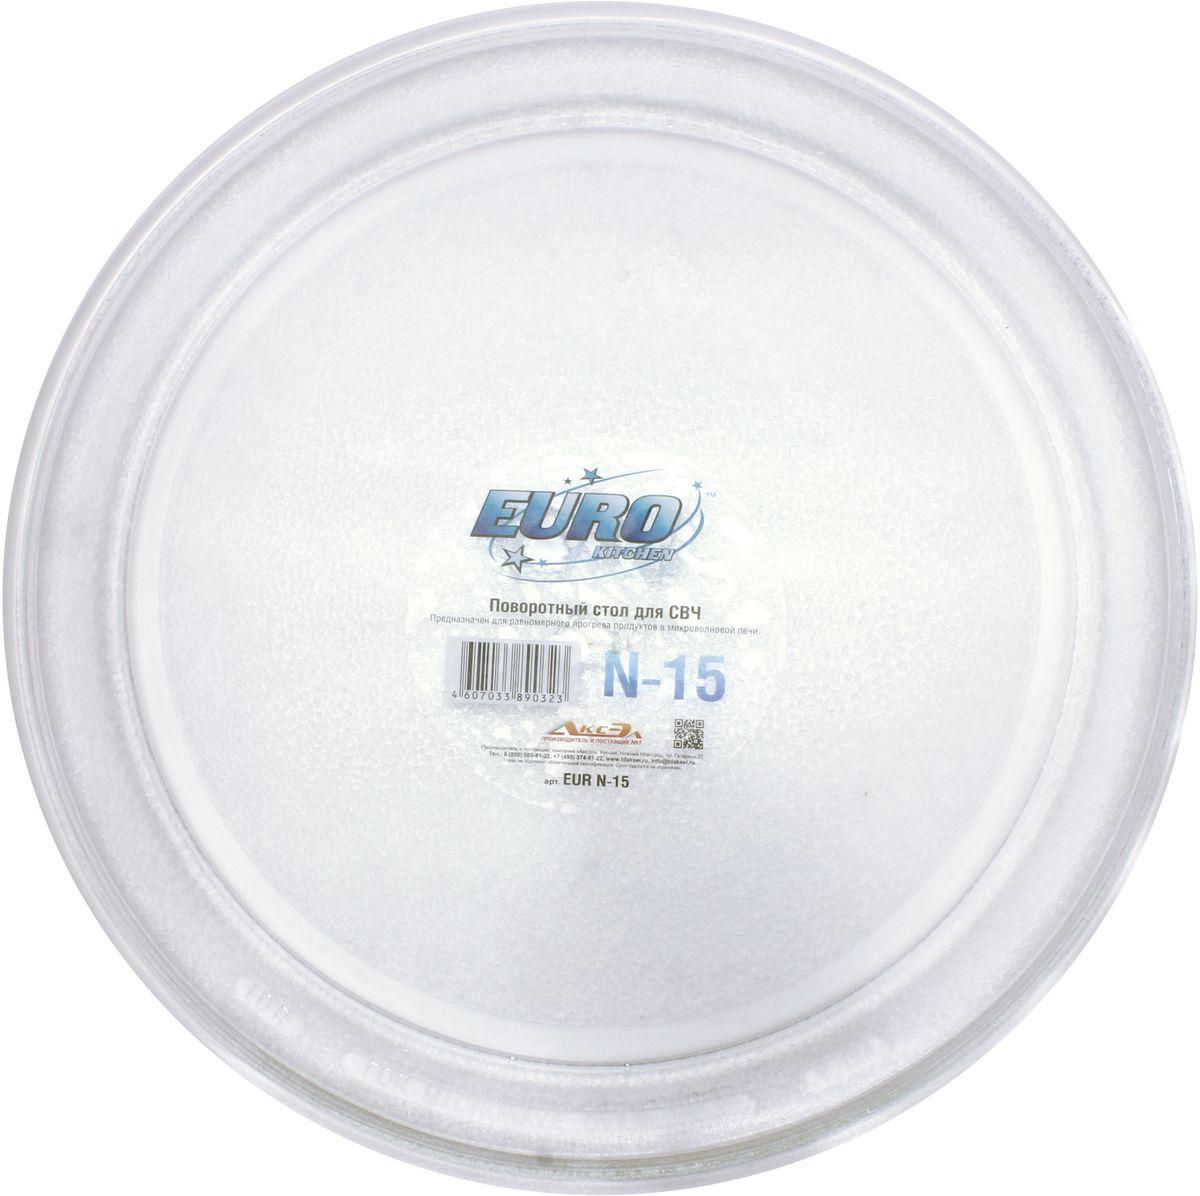 Euro Kitchen N-15 тарелка для СВЧN-15Универсальная тарелка N-15 для микроволновой печи с куплером. Диаметр тарелки 335 мм. Изготовлена из специального жаропрочного стекла. Предназначена для равномерного разогрева продуктов в микроволновой печи.Подходит для брендов:Aeg, Airhot, Amica, Ardo, Ariston, Asko, Atlanta, Aurora, Ava, Barazza, Bauknecht, Bbk, Beko, Bomann, Bork, Bosch, Brandt, Candy, Cata, Centek, Clatronic, Daewoo, De dietrich, Delfa, Electrolux, Elenberg, Ergo, Erisson, Eurotec, Fagor, Fimar, Foster, Franke, Fulgor, Fusion, Gaggenau, Gastrorag, Goldstar, Gorenje, Hankel, Hansa, Hilton, Horizont, Hurakan, Hyundai, Ilve, Indesit, Kaiser, Kenmore, Kenwood, Korting, Kuppersberg, Kuppersbusch, Kamark, Keran, Lg, Liberton, Liberty, Maxwell, Menumaster, Midea, Miele, Moulinex, Mystery, Neff, Oursson, Panasonic, Proficook, Rainford, Redmond, Rolsen, Samsung, Saturn, Scarlett, Sencor, Sharp, Siemens, Simfer, Sinbo, Sirman, Smeg, Supra, Teka, Thomson, Toshiba, V-zug, Vasko, Vimar, Vitek, Vr, Weissgauff, West, Whirlpool, Zanussi, Zelmer, Zigmund&Shtain, Витязь, Рубин.